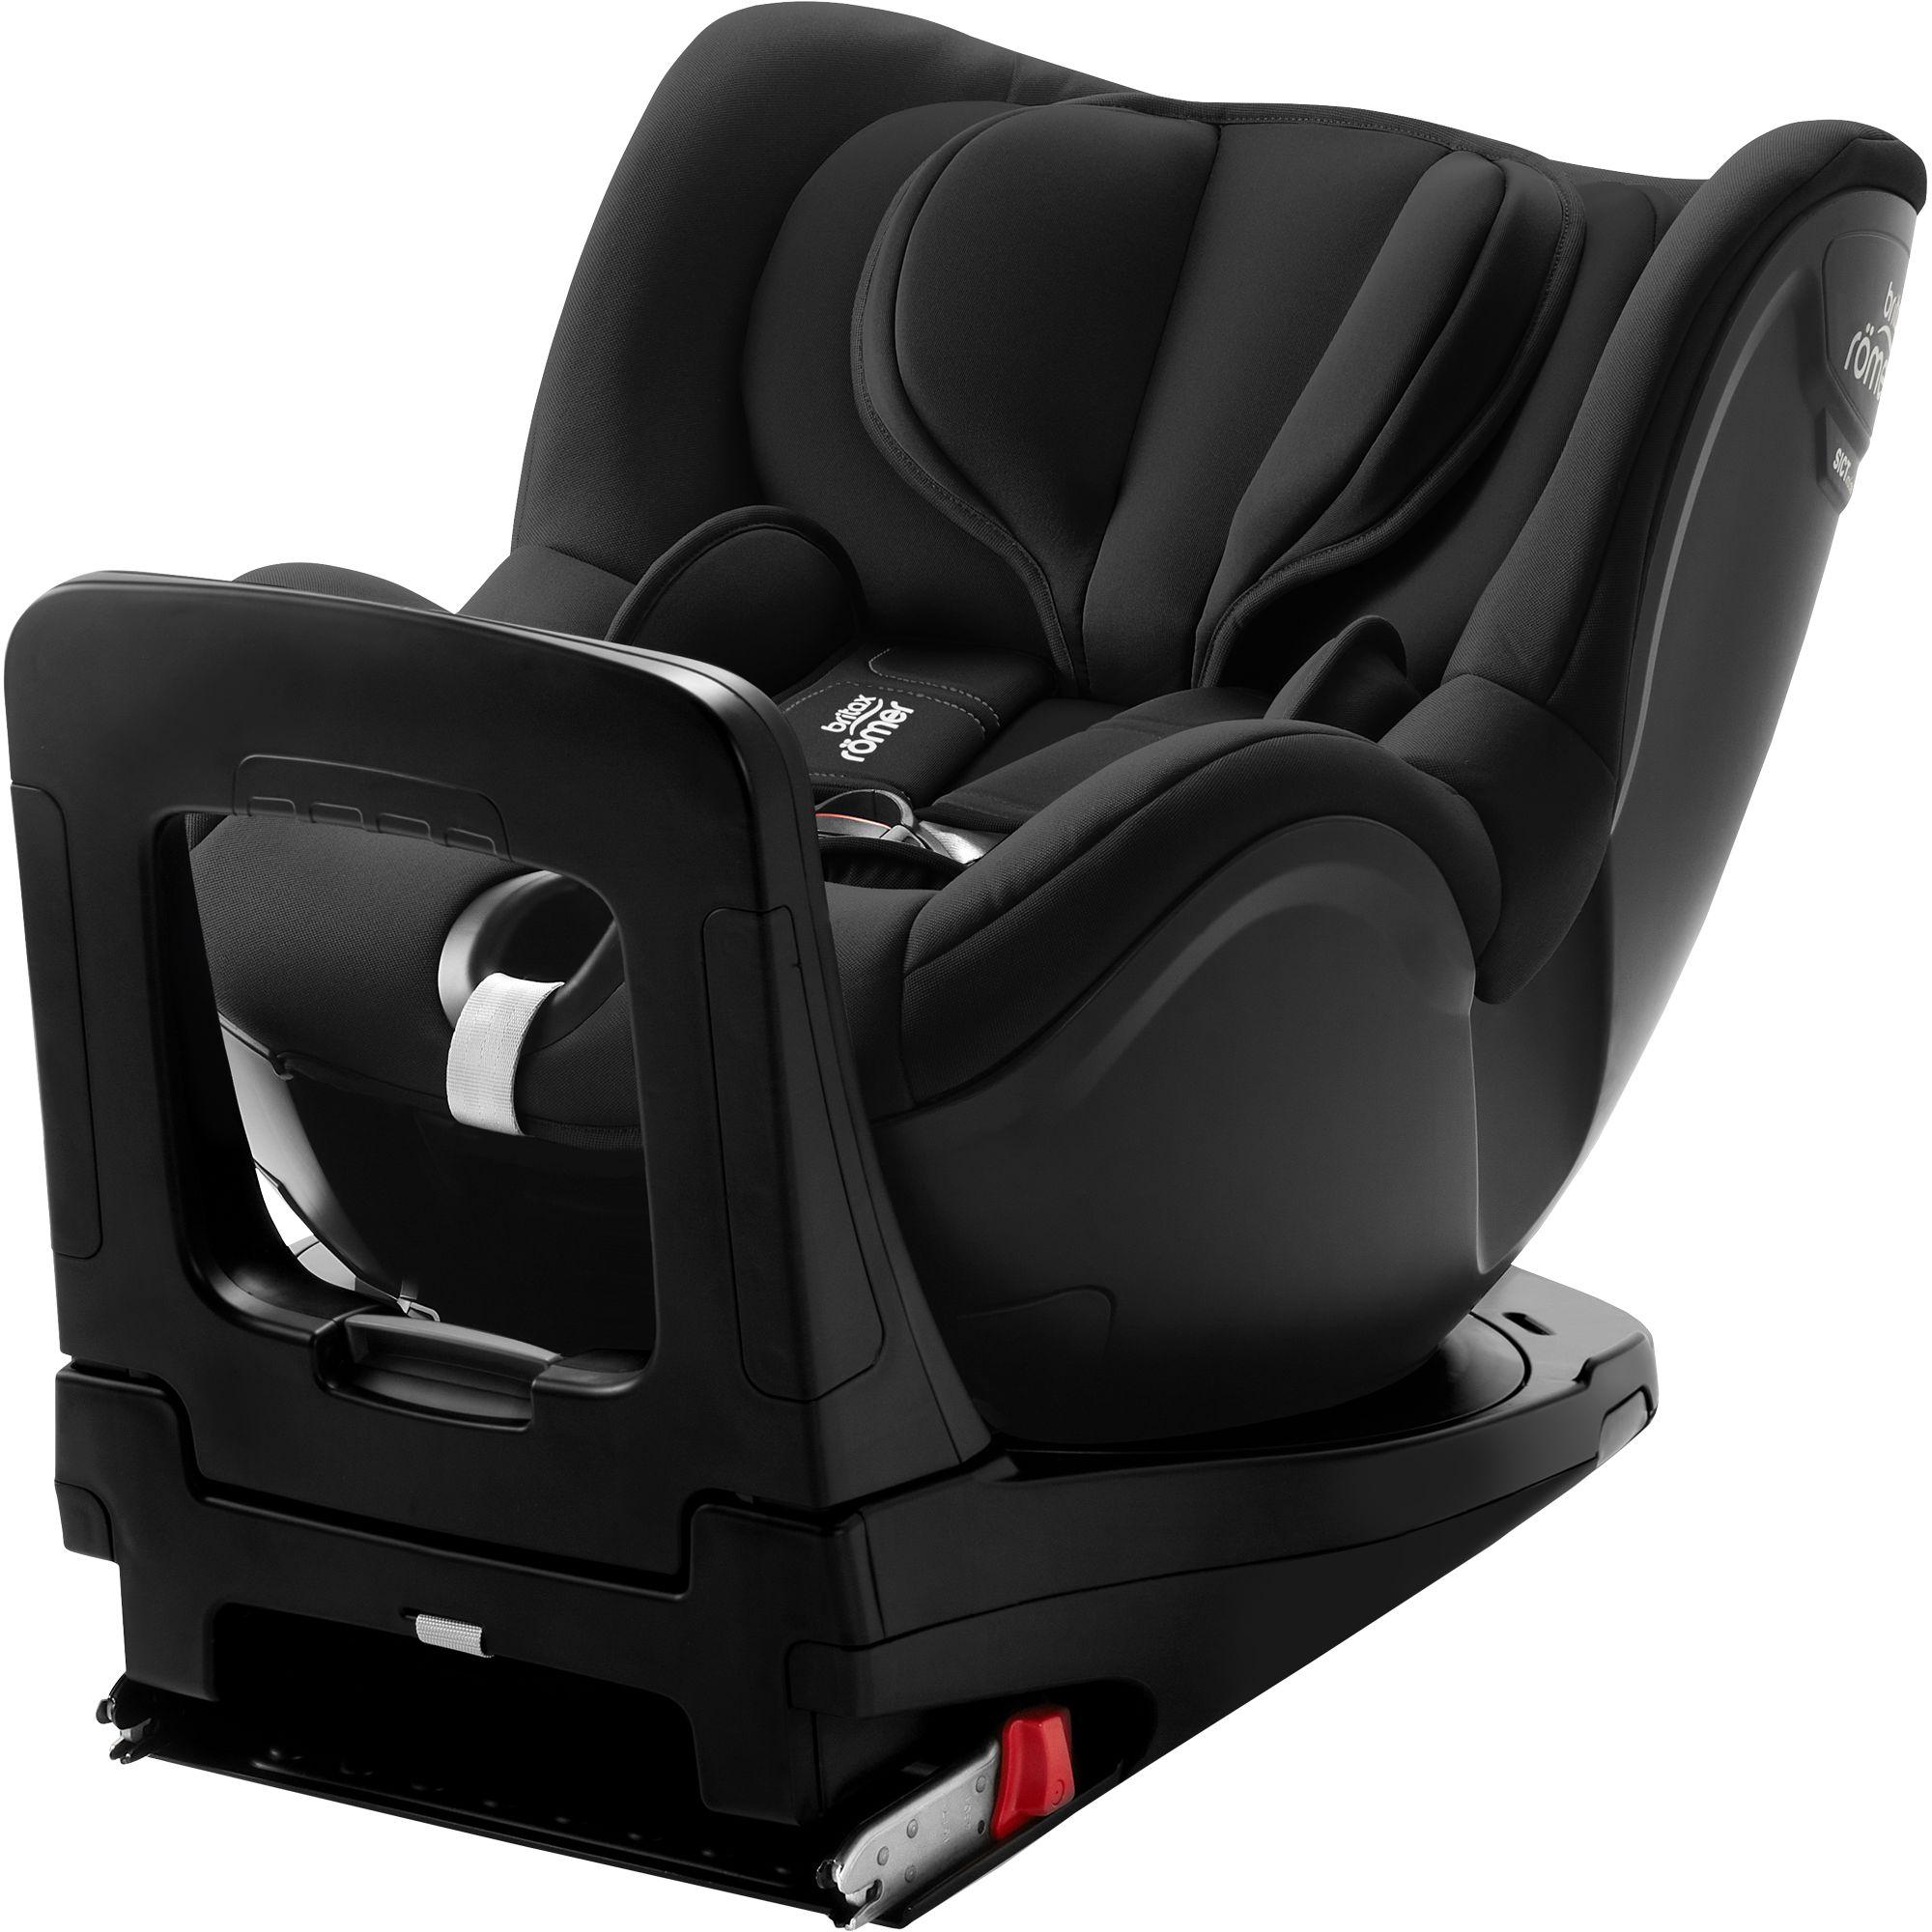 ROMER Dualfix i-Size Cosmos Black 2020